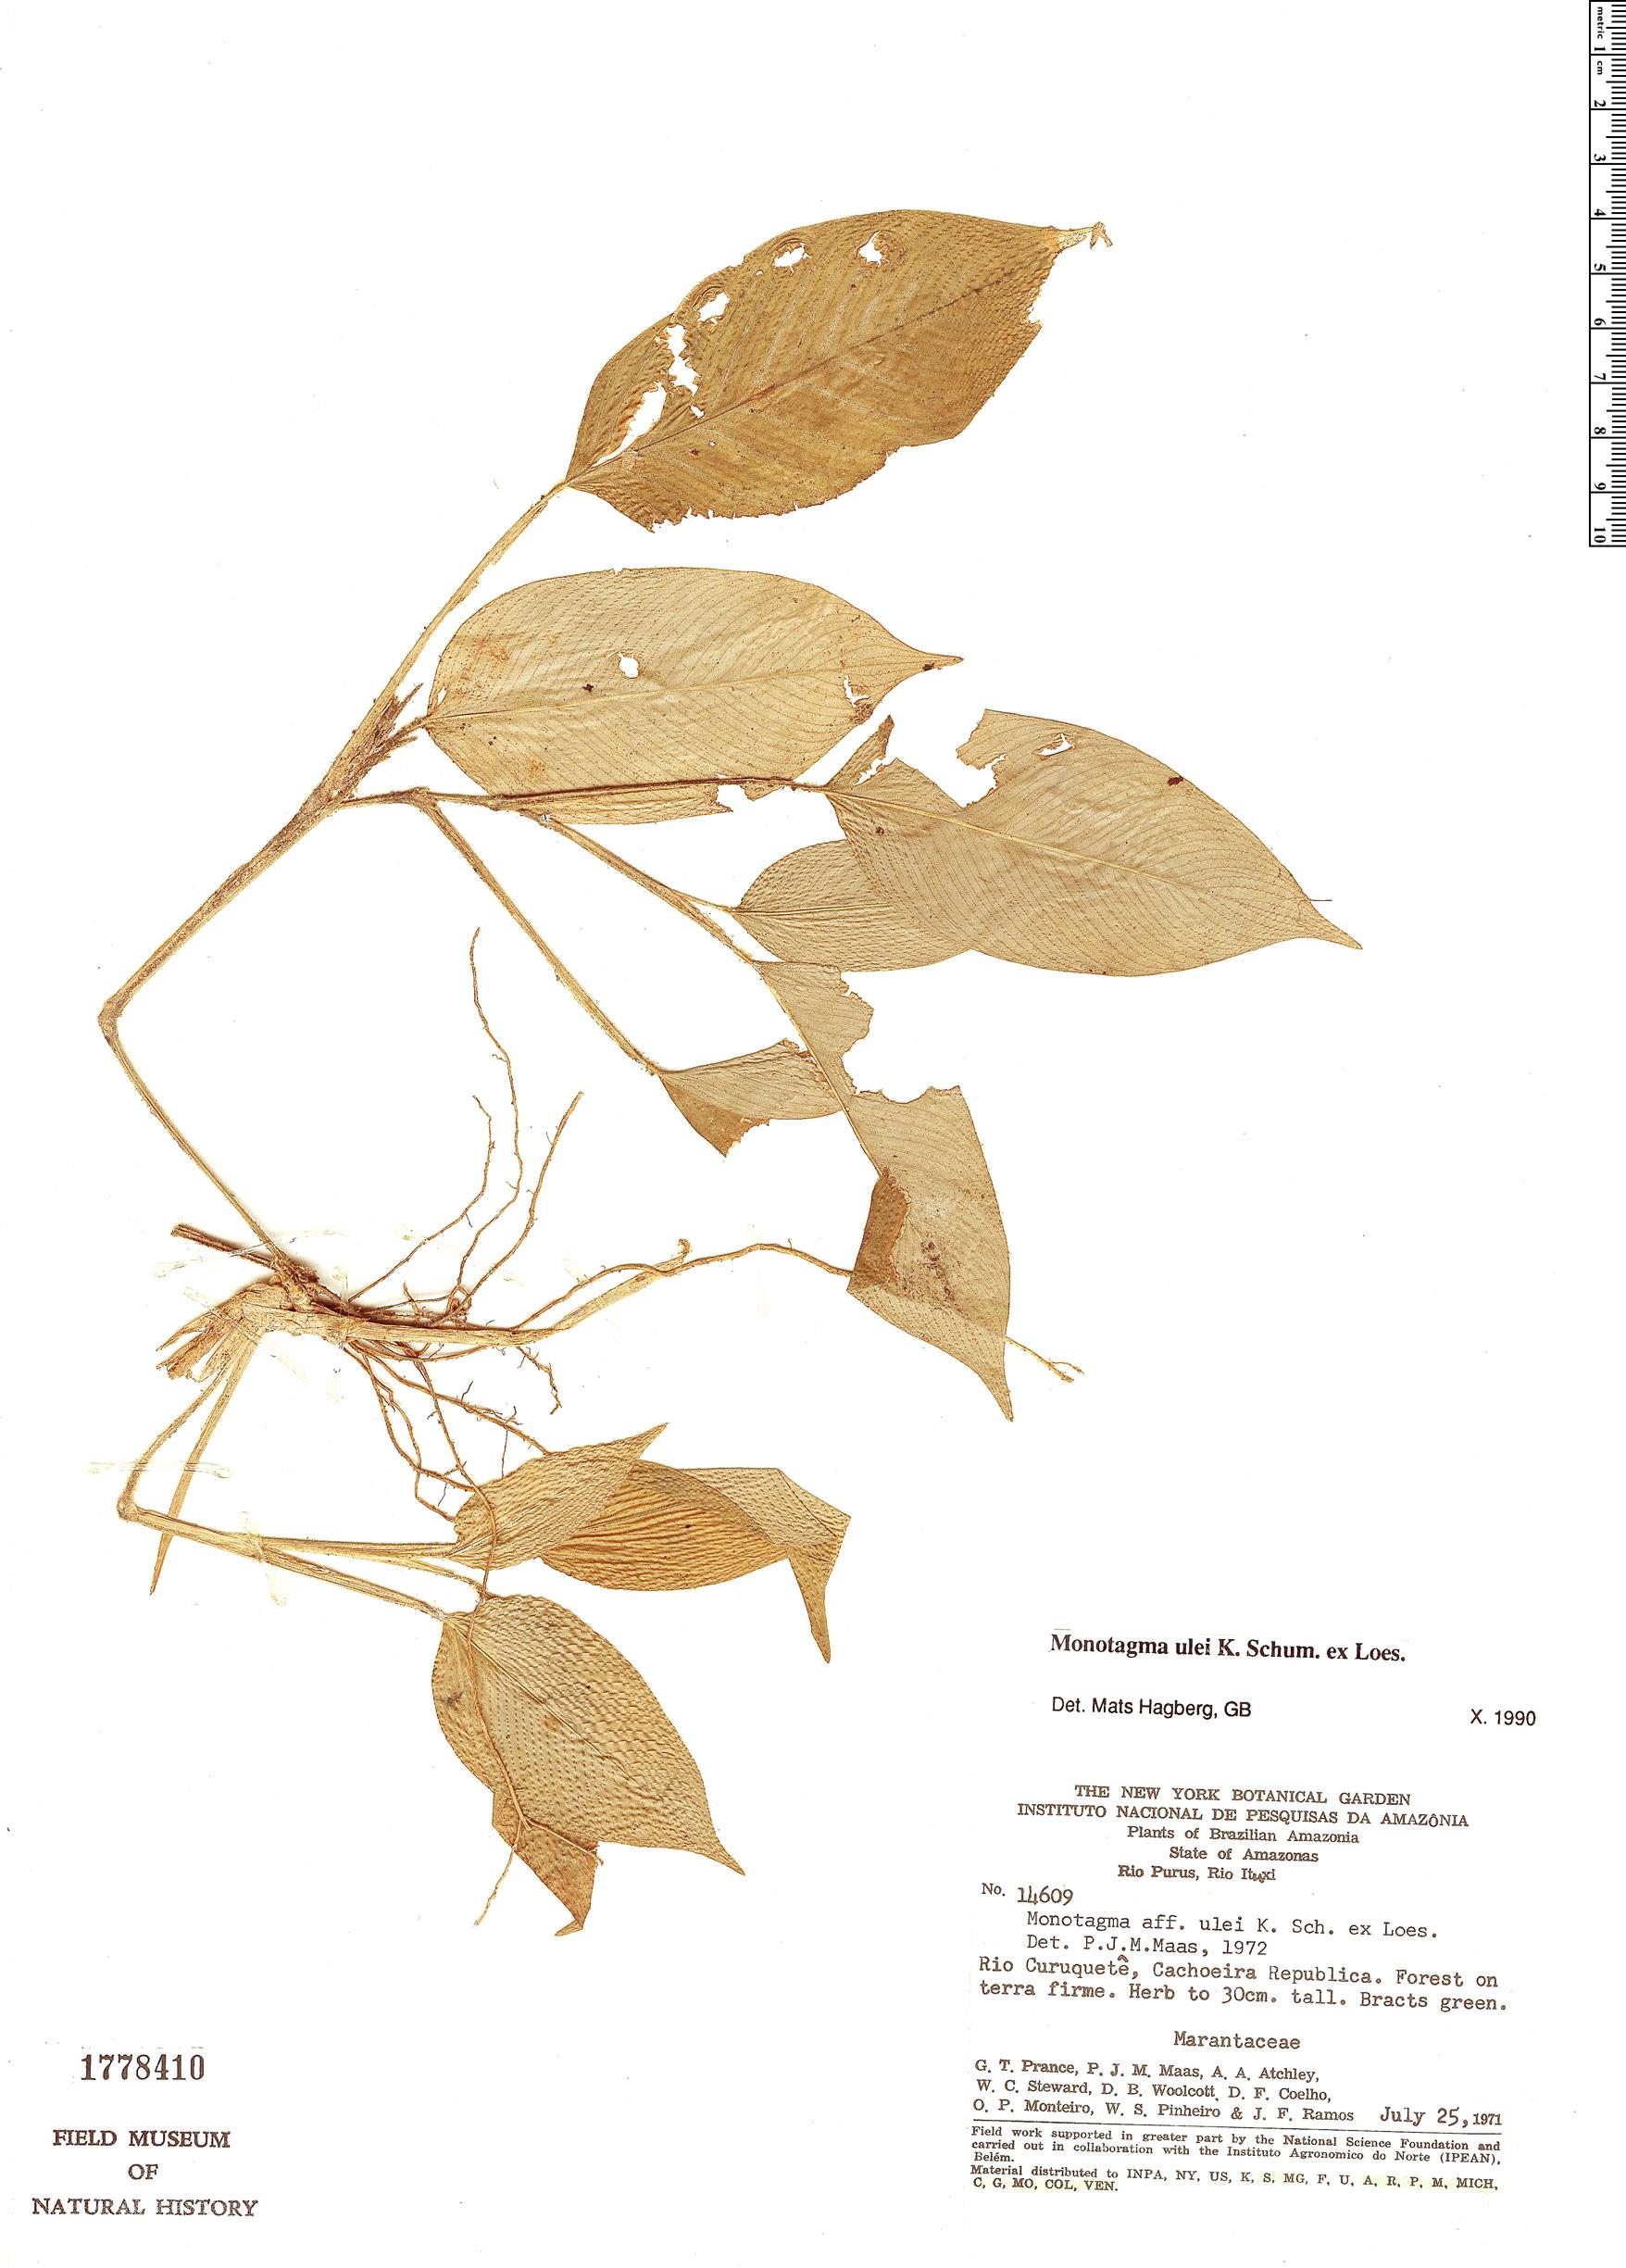 Specimen: Monotagma ulei